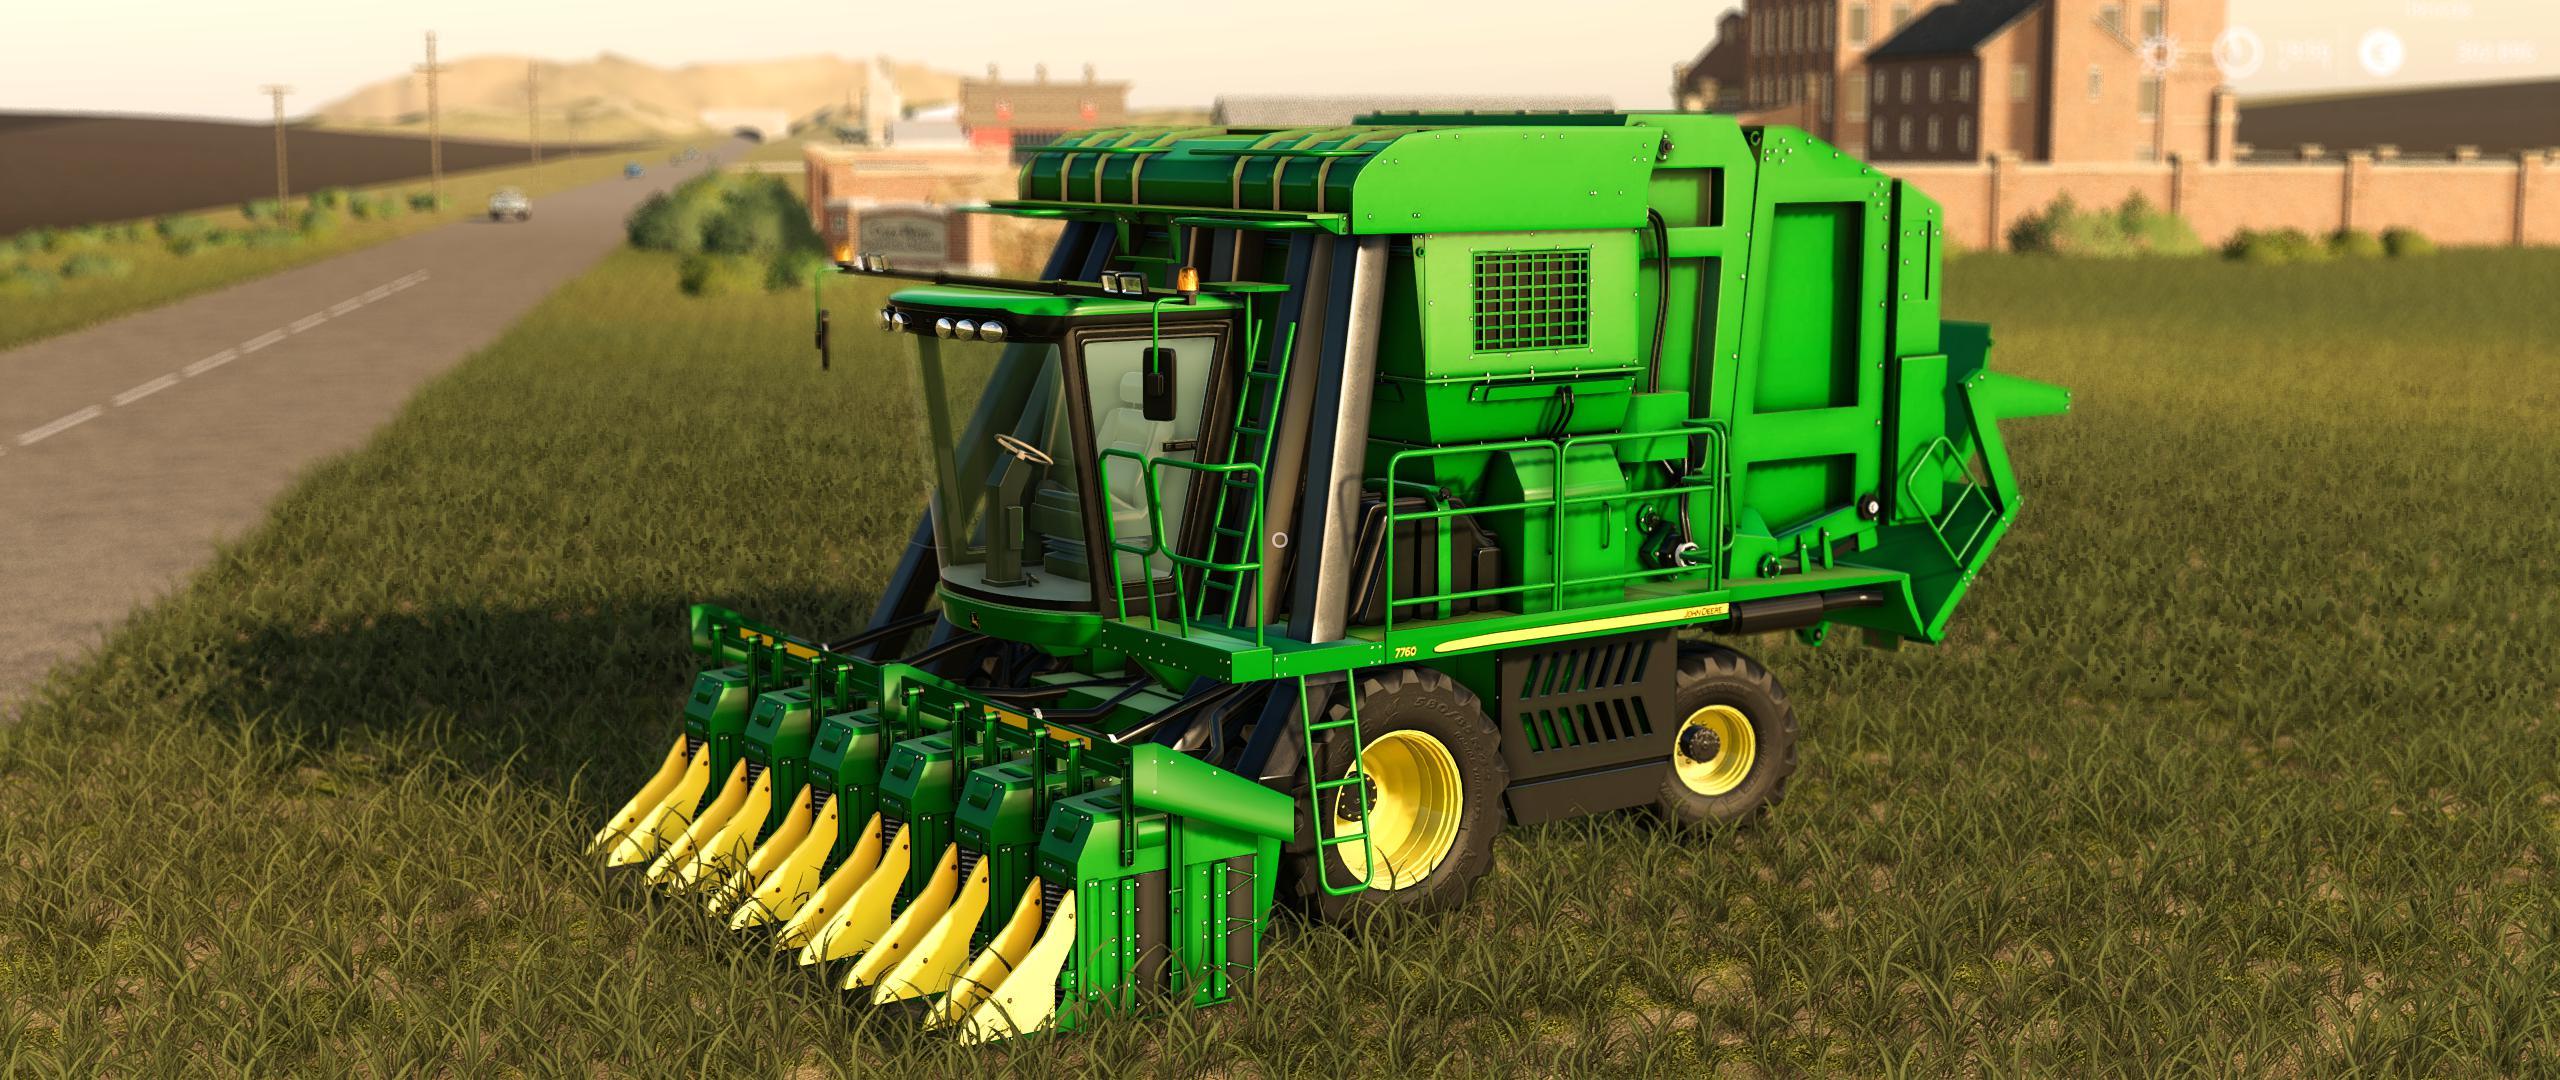 JOHN DEERE 7760 COTTON Baler v1 1 FS19 - Farming Simulator